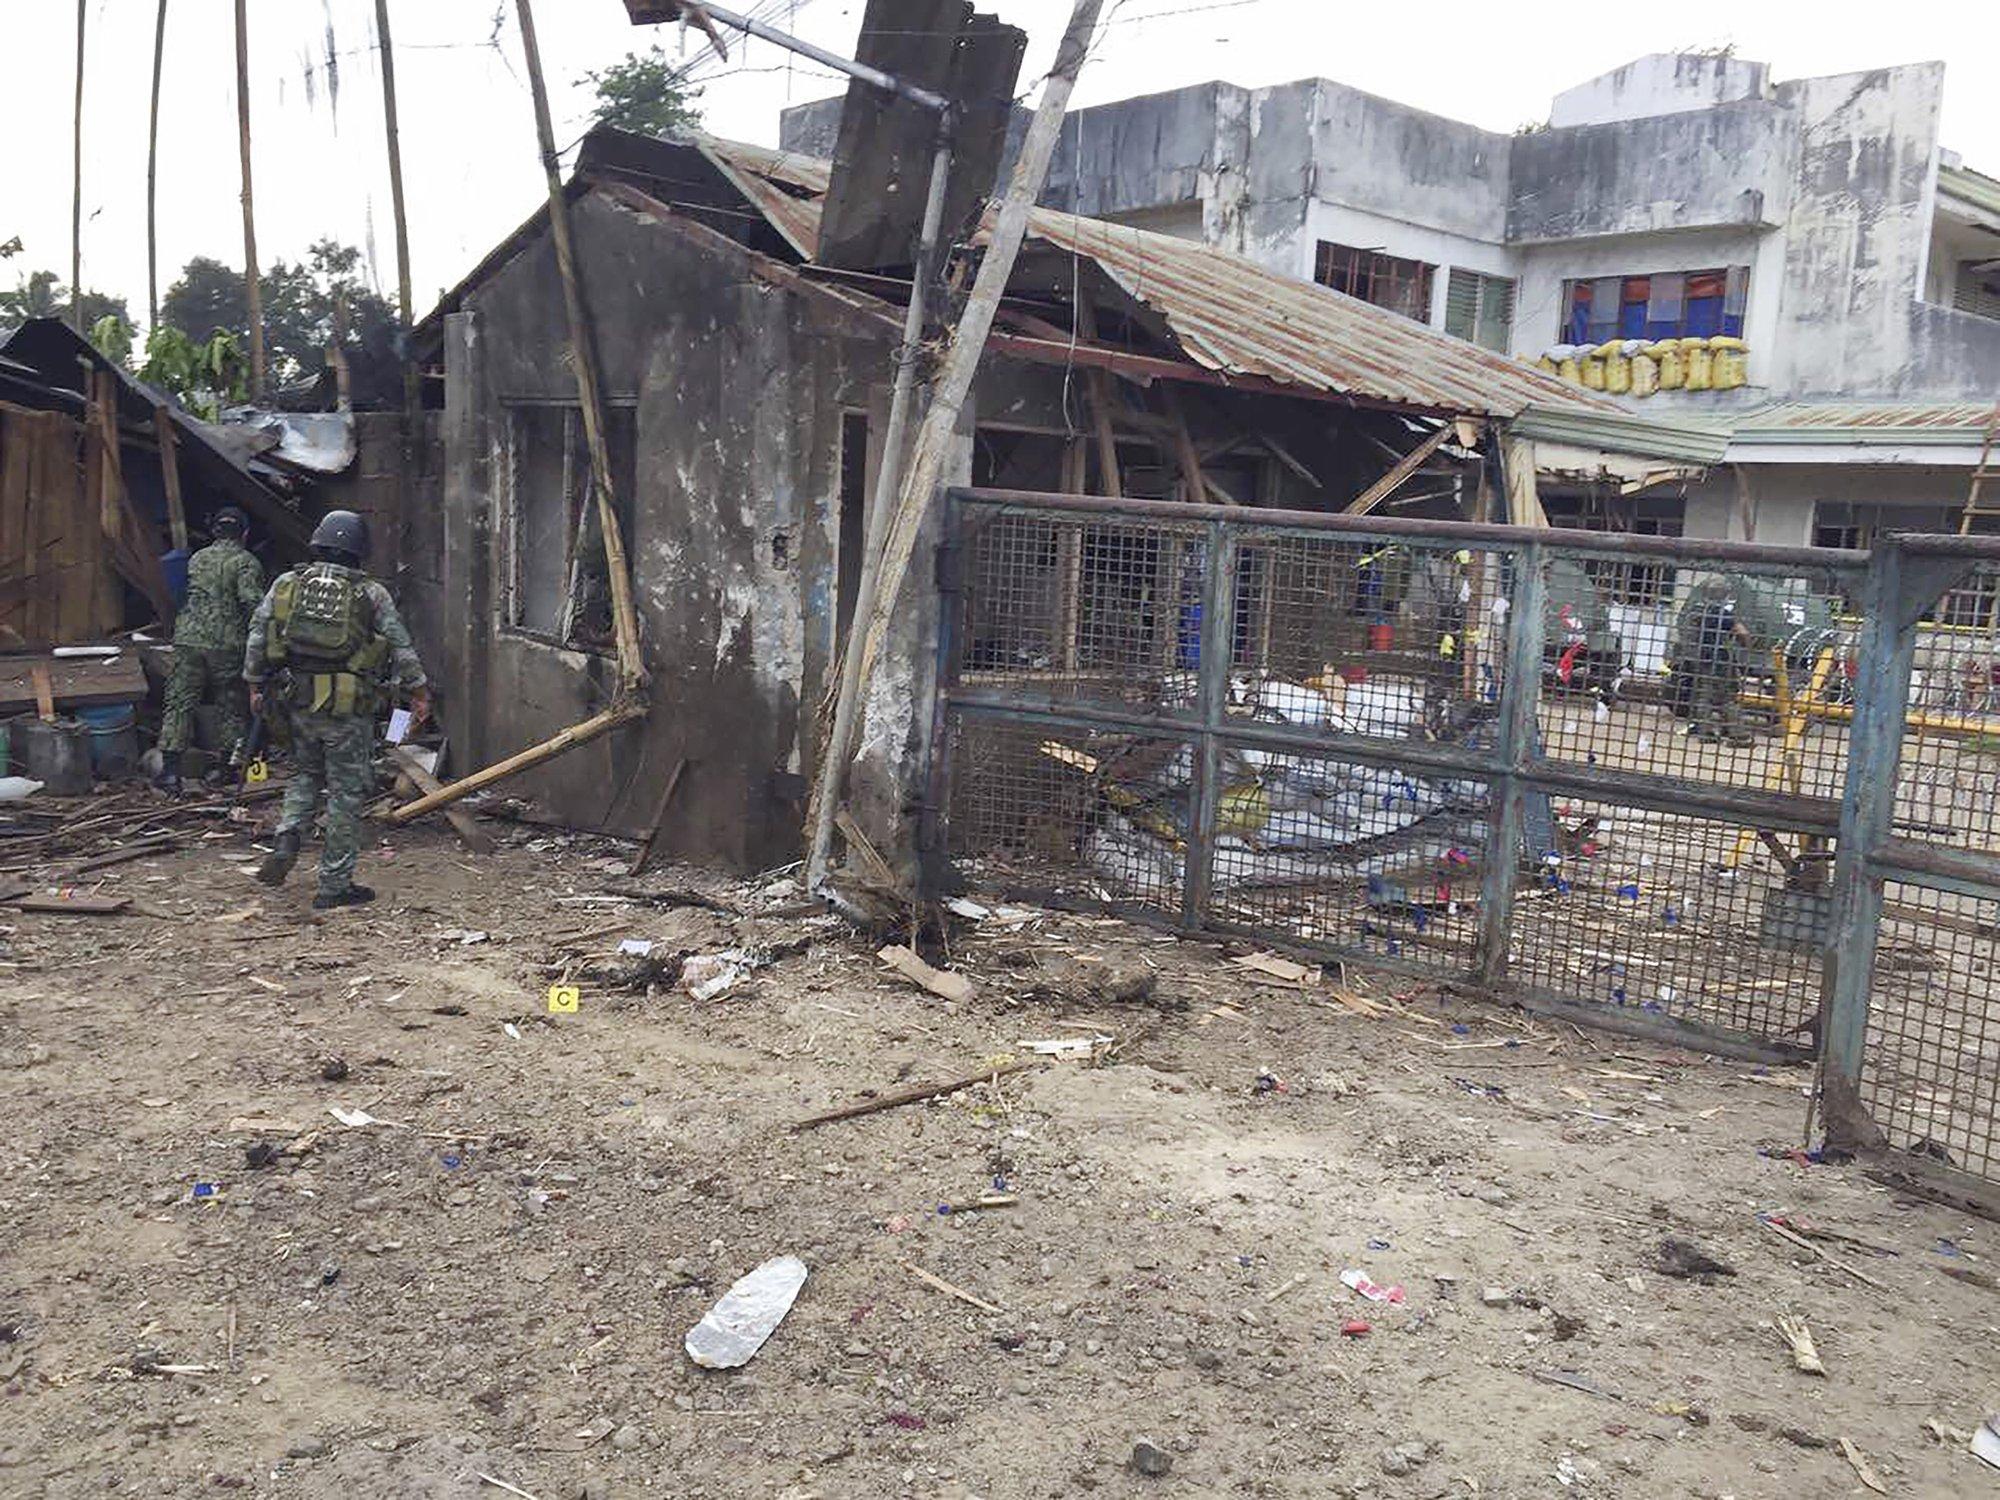 Philippines: 1st known Filipino suicide attacker identified